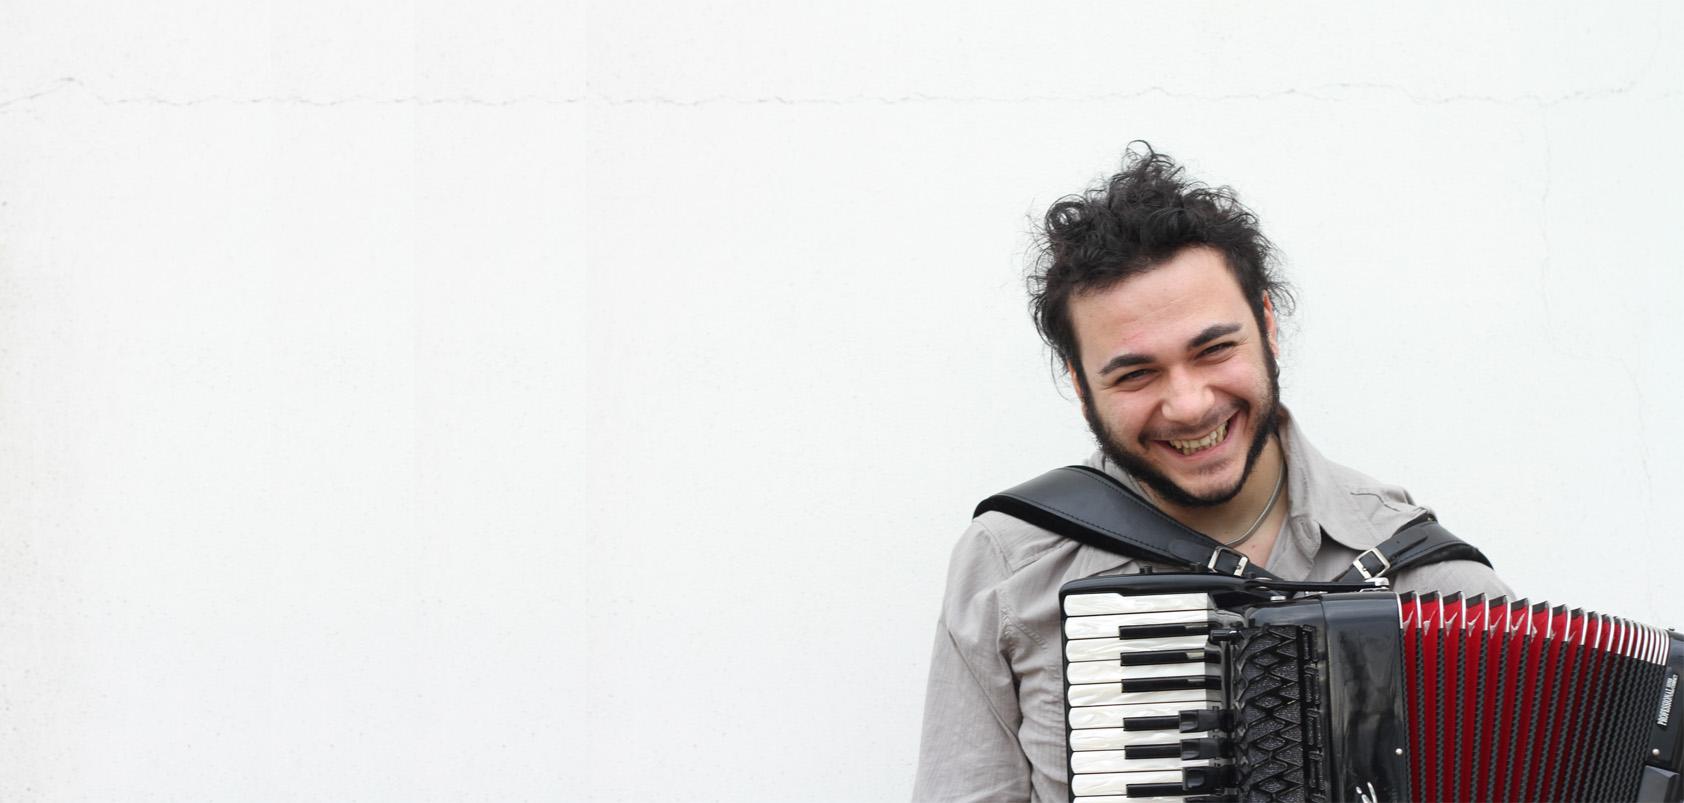 Giorgio Albanese | Jazz Accordion Player & Composer | Fisarmonicista